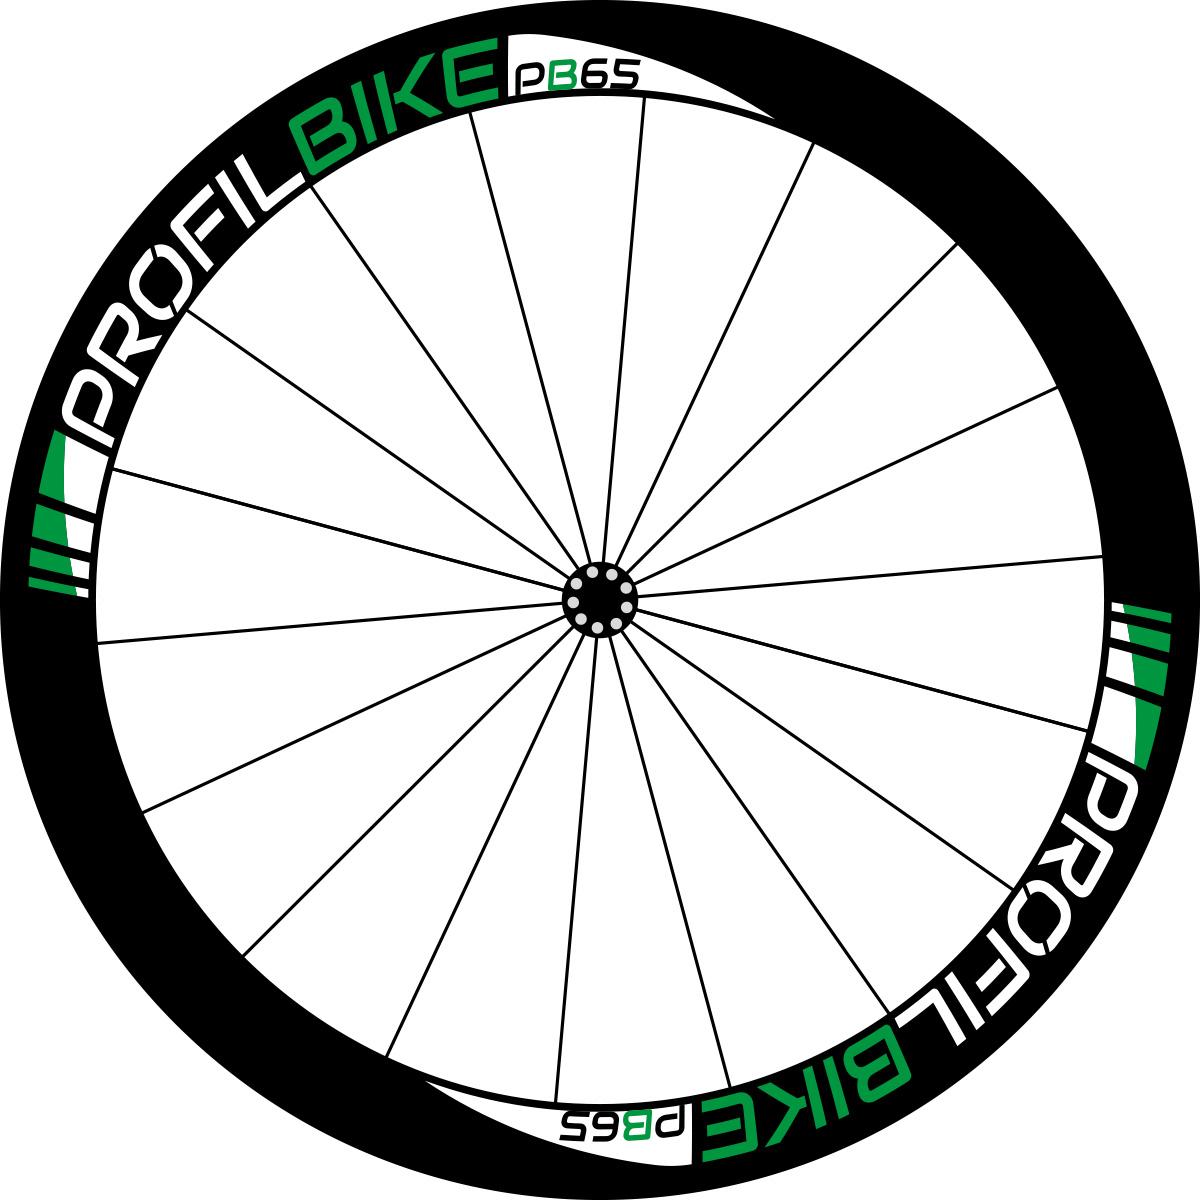 Profilbike PB65 CARBON design vert